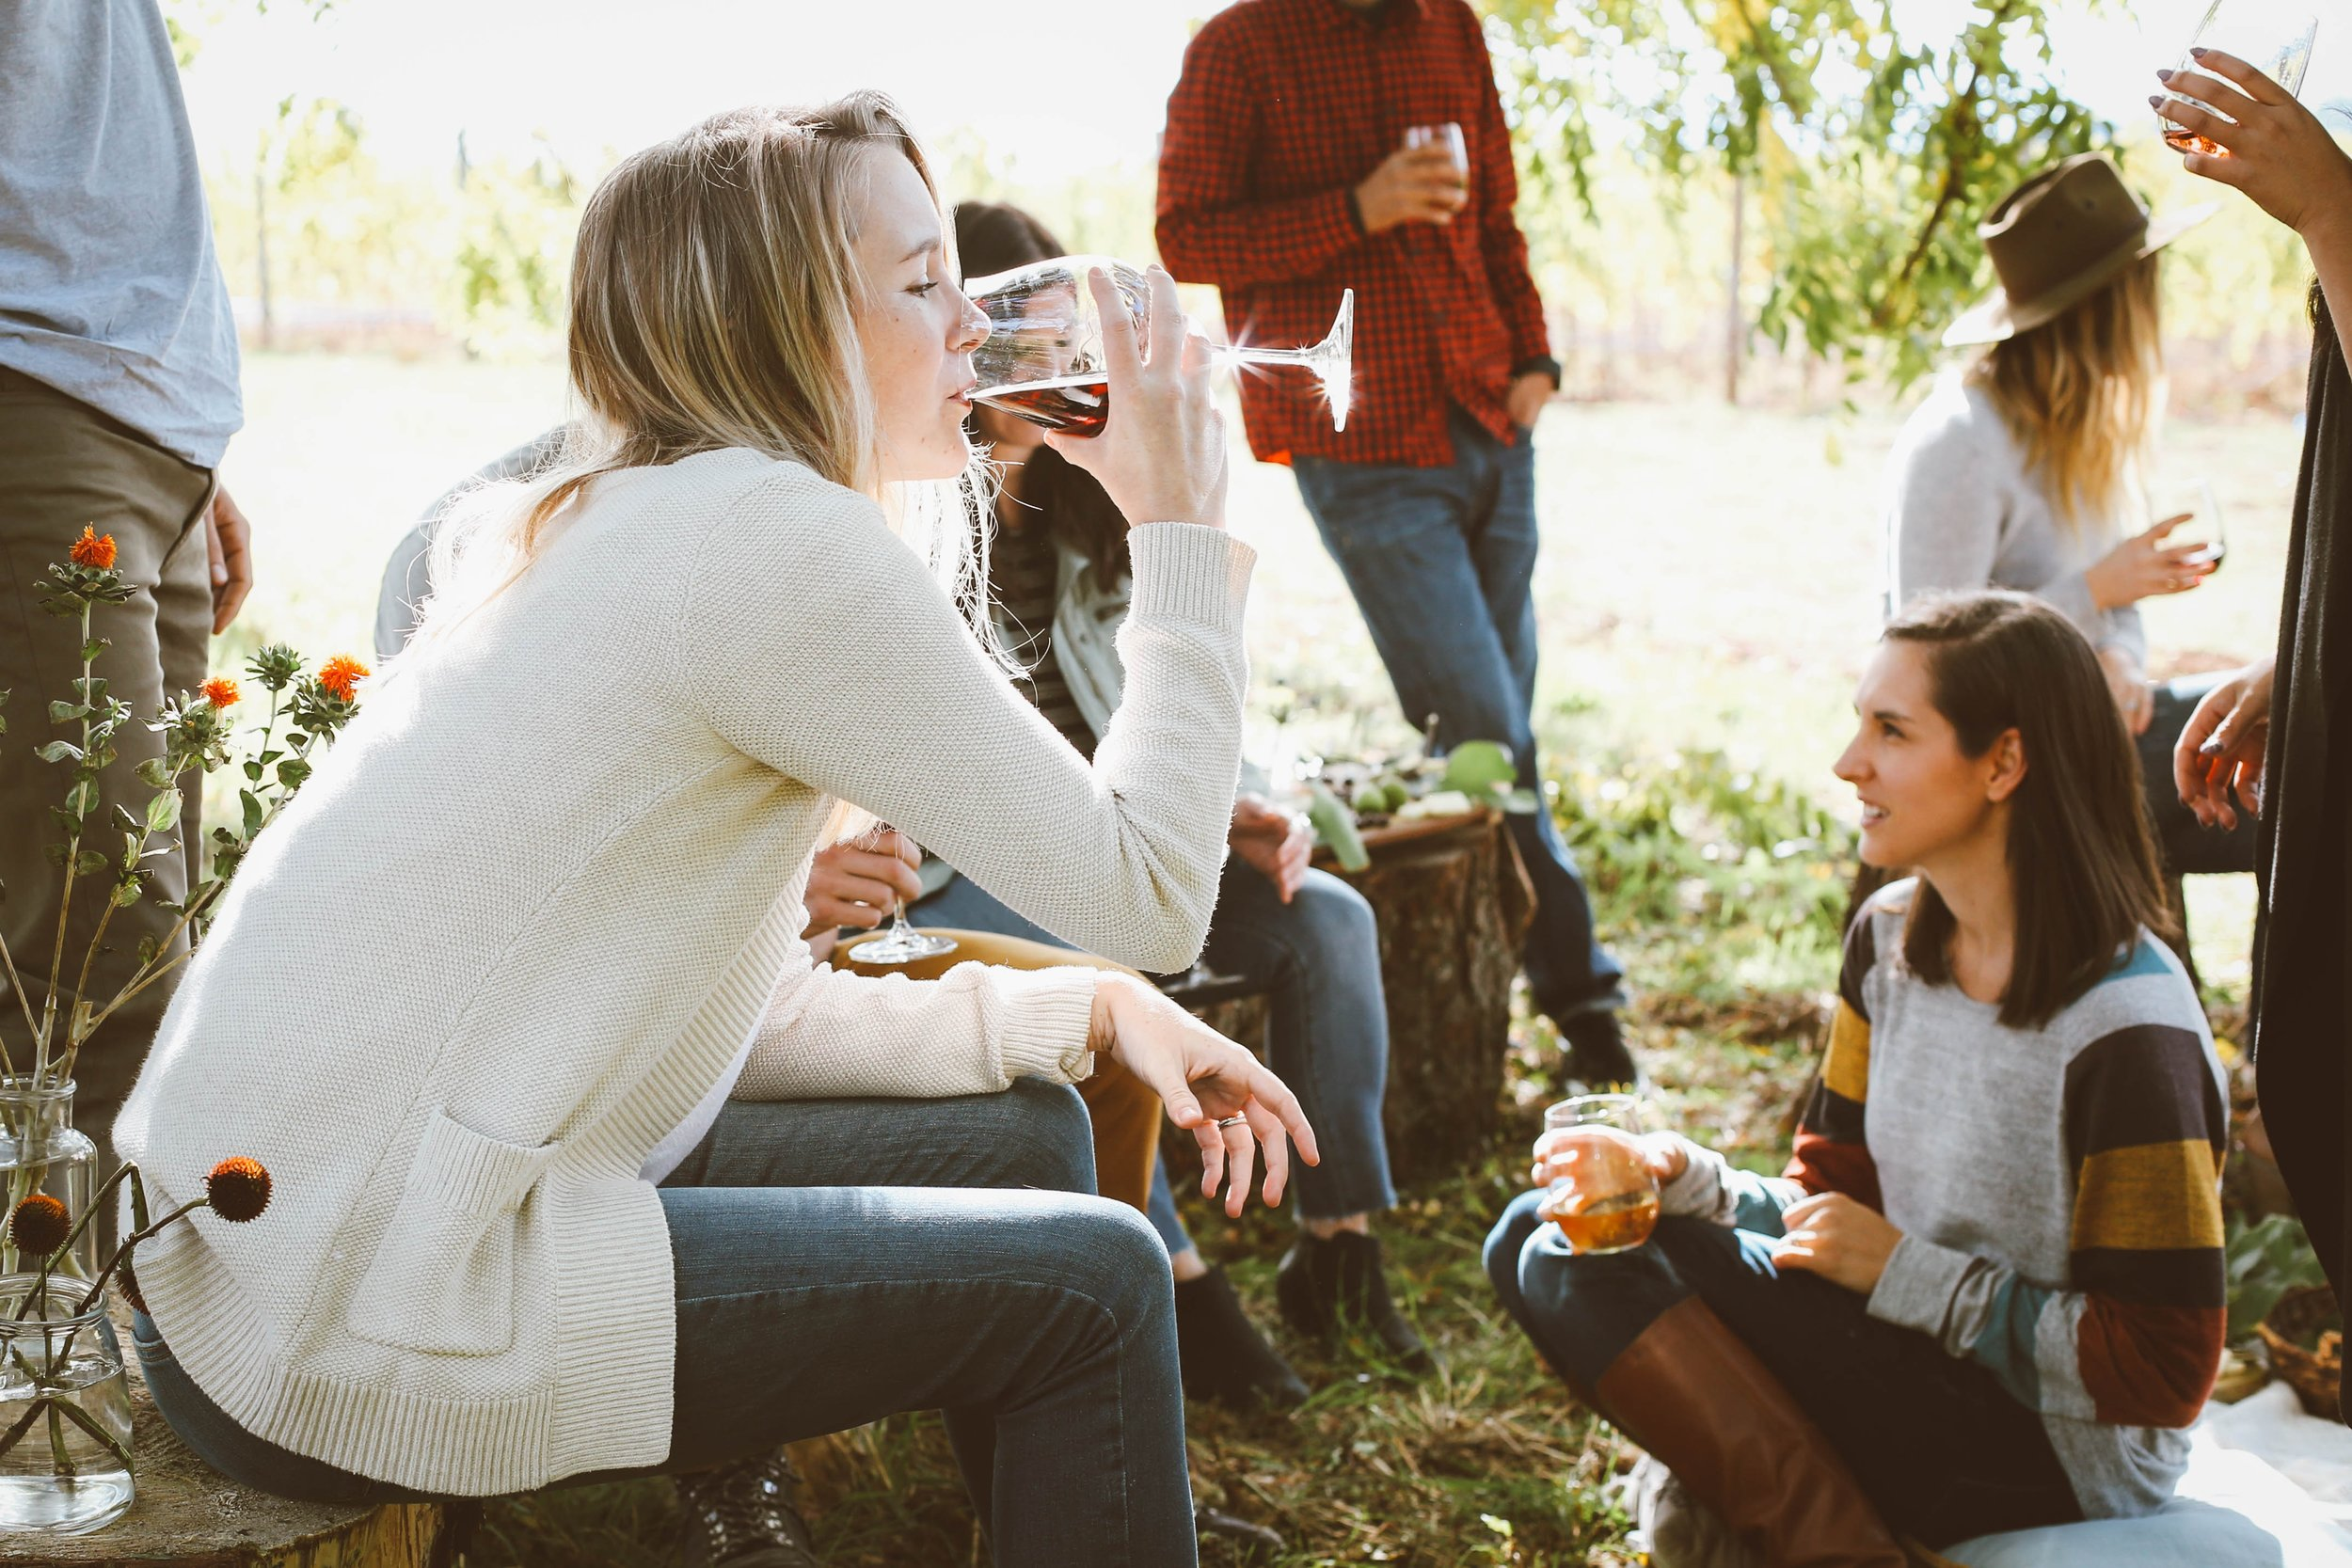 millennials drinking wine outdoors